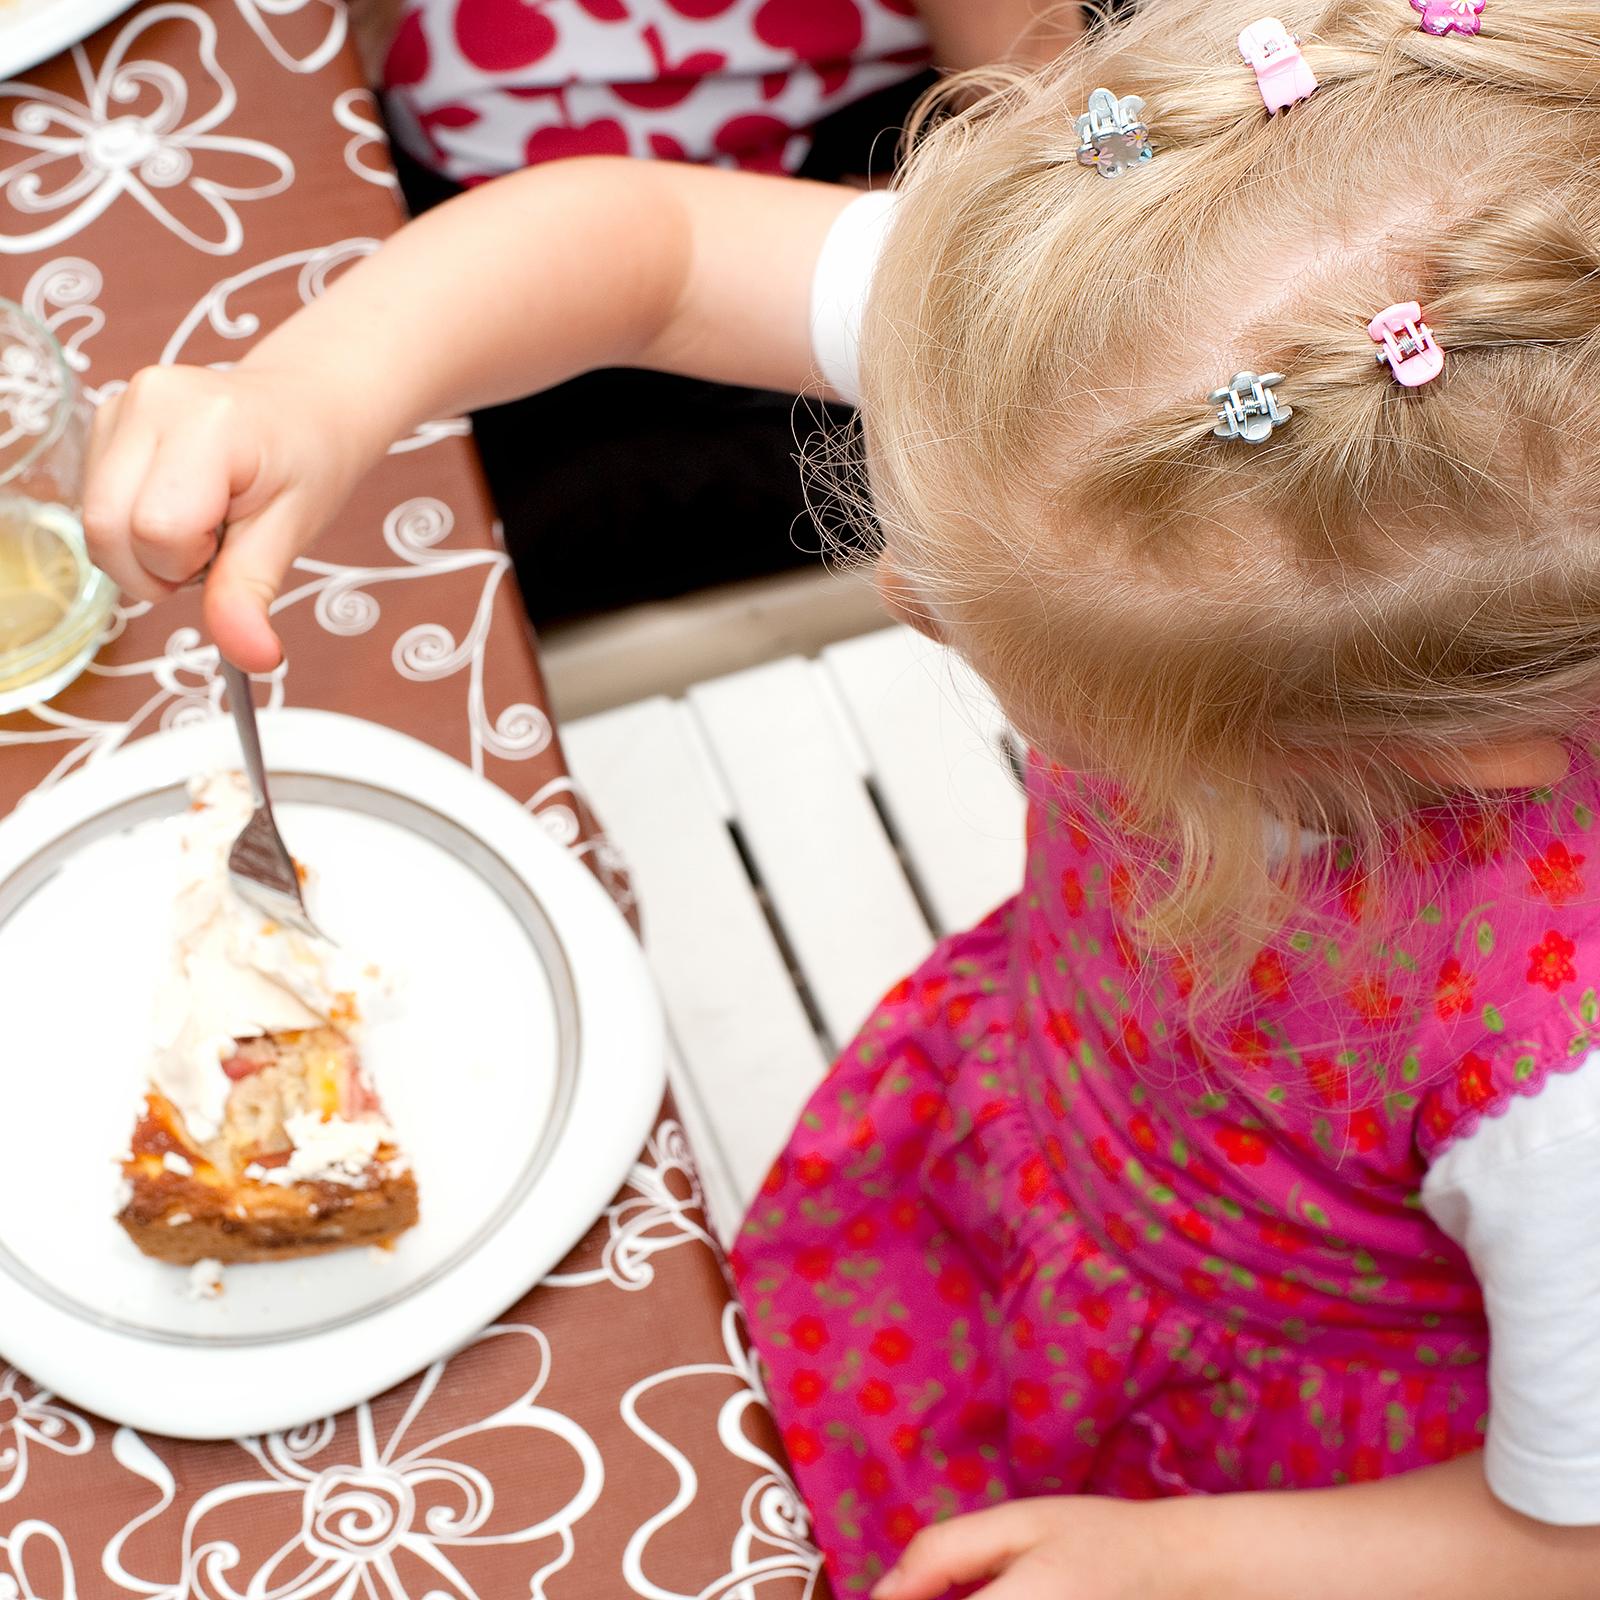 KatjaDell_series_coffeeandcake3.jpg